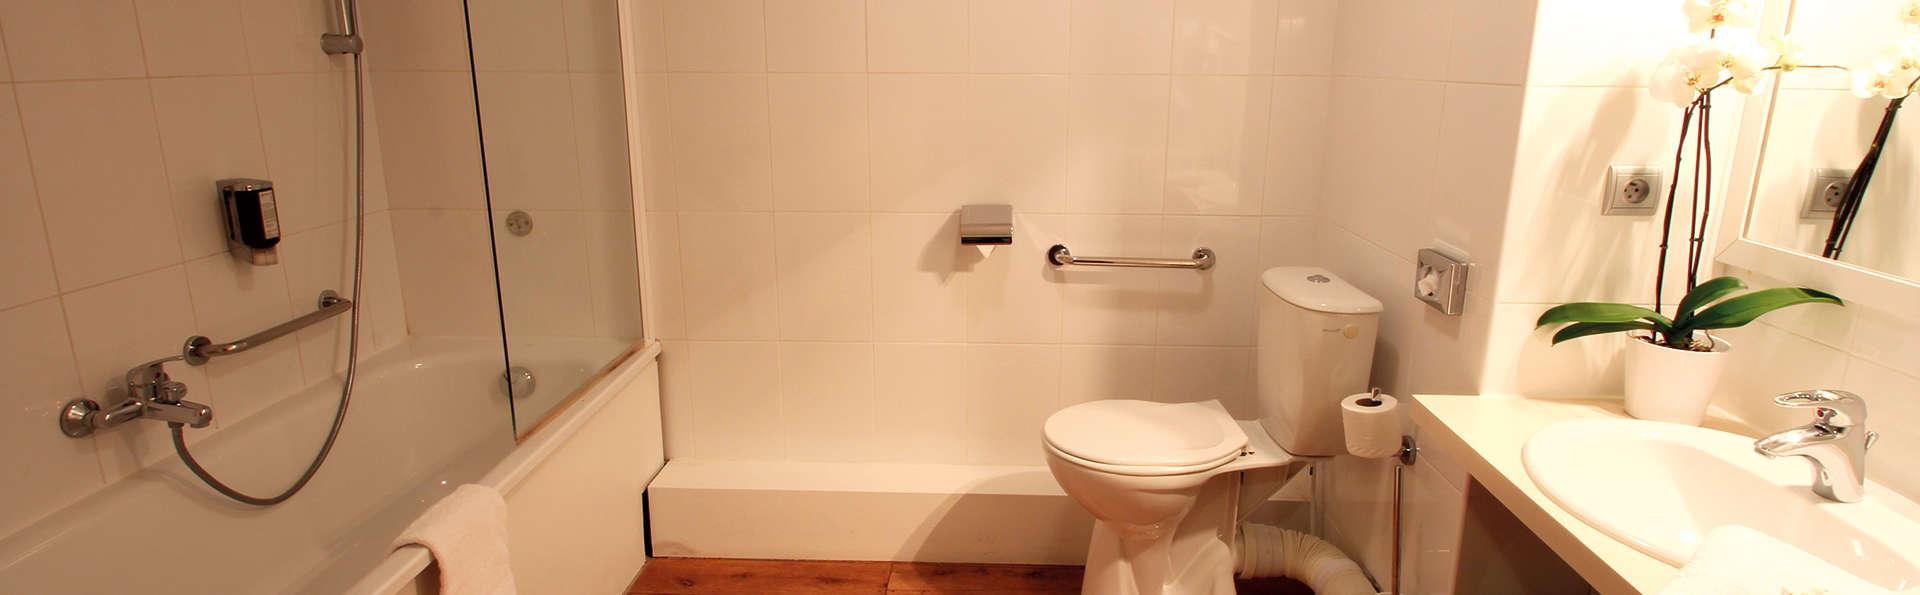 Appart'City Confort Montpellier Ovalie I  - Edit_Batroom.jpg